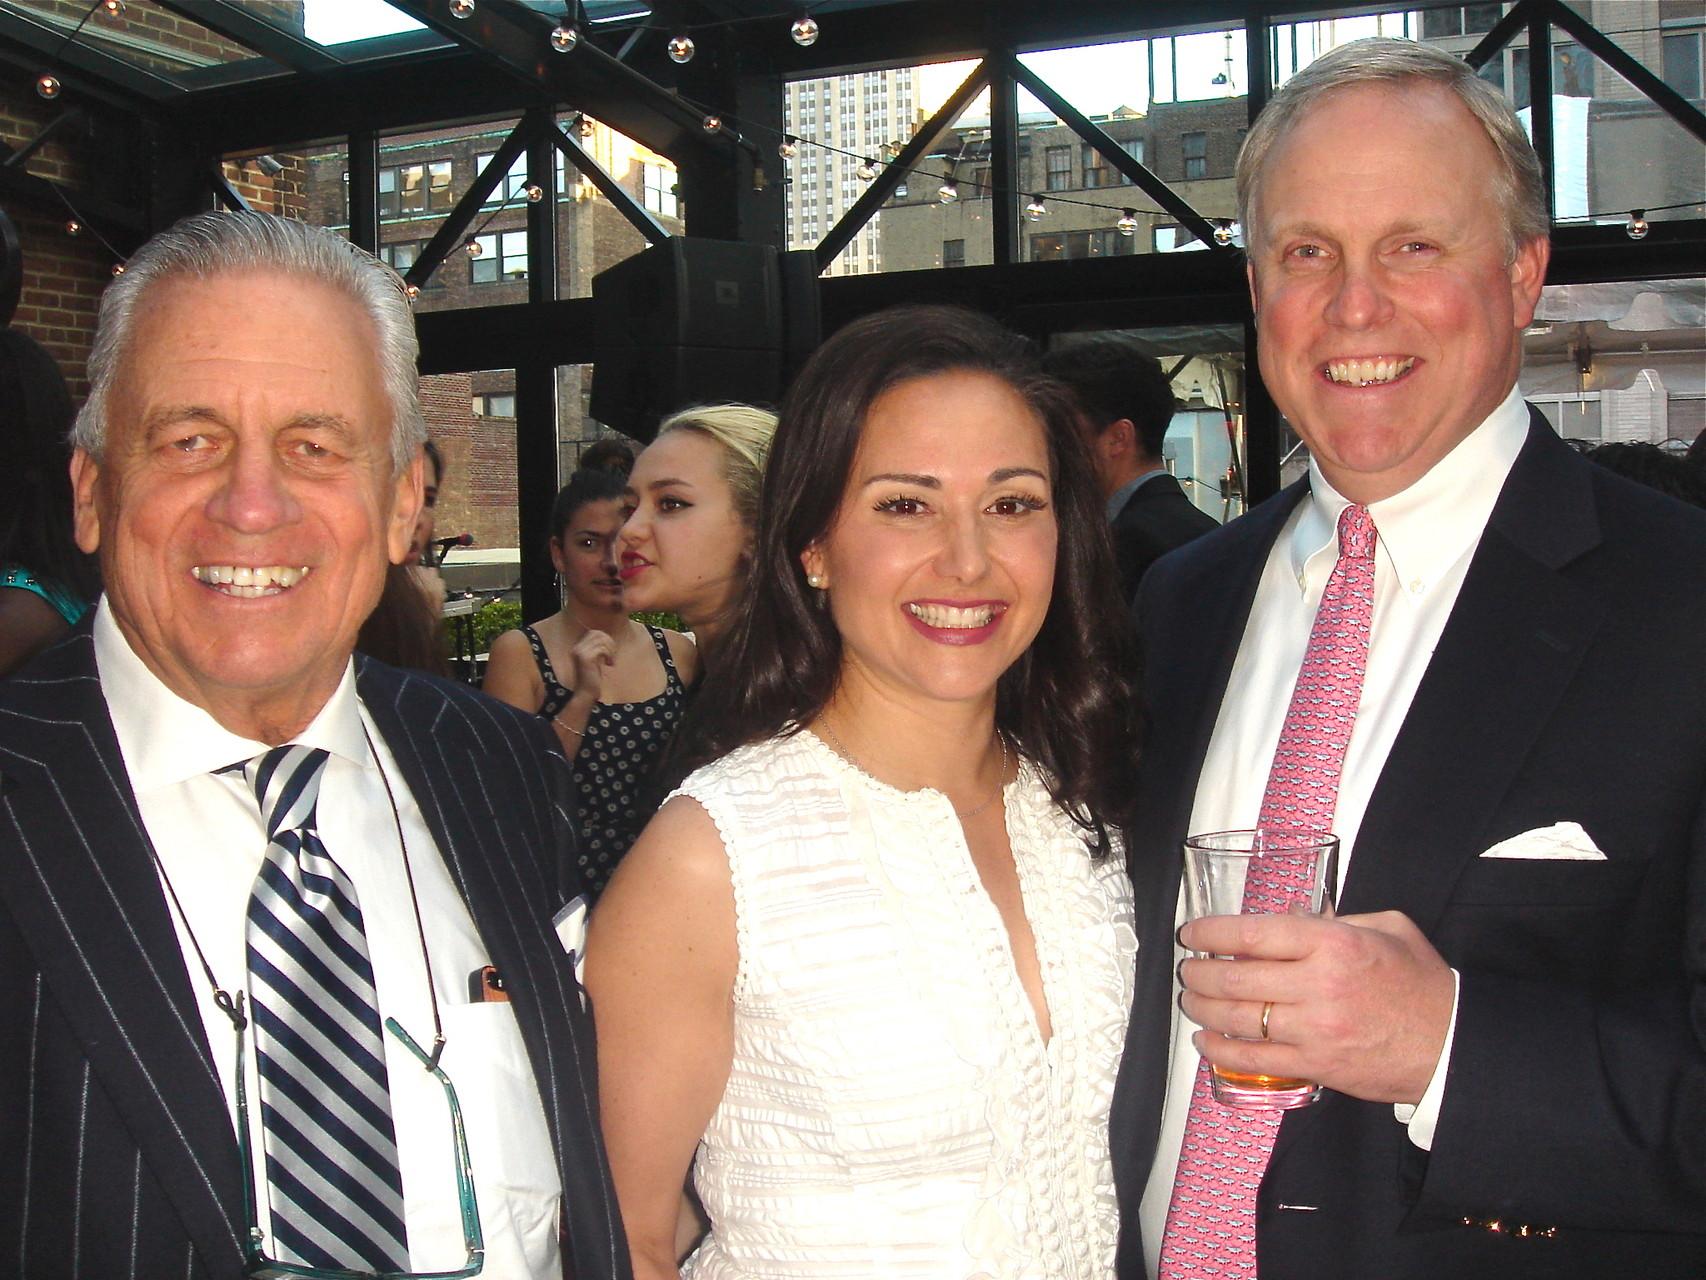 Stuart Sr., Allie, and Stuart Kagel Jr.